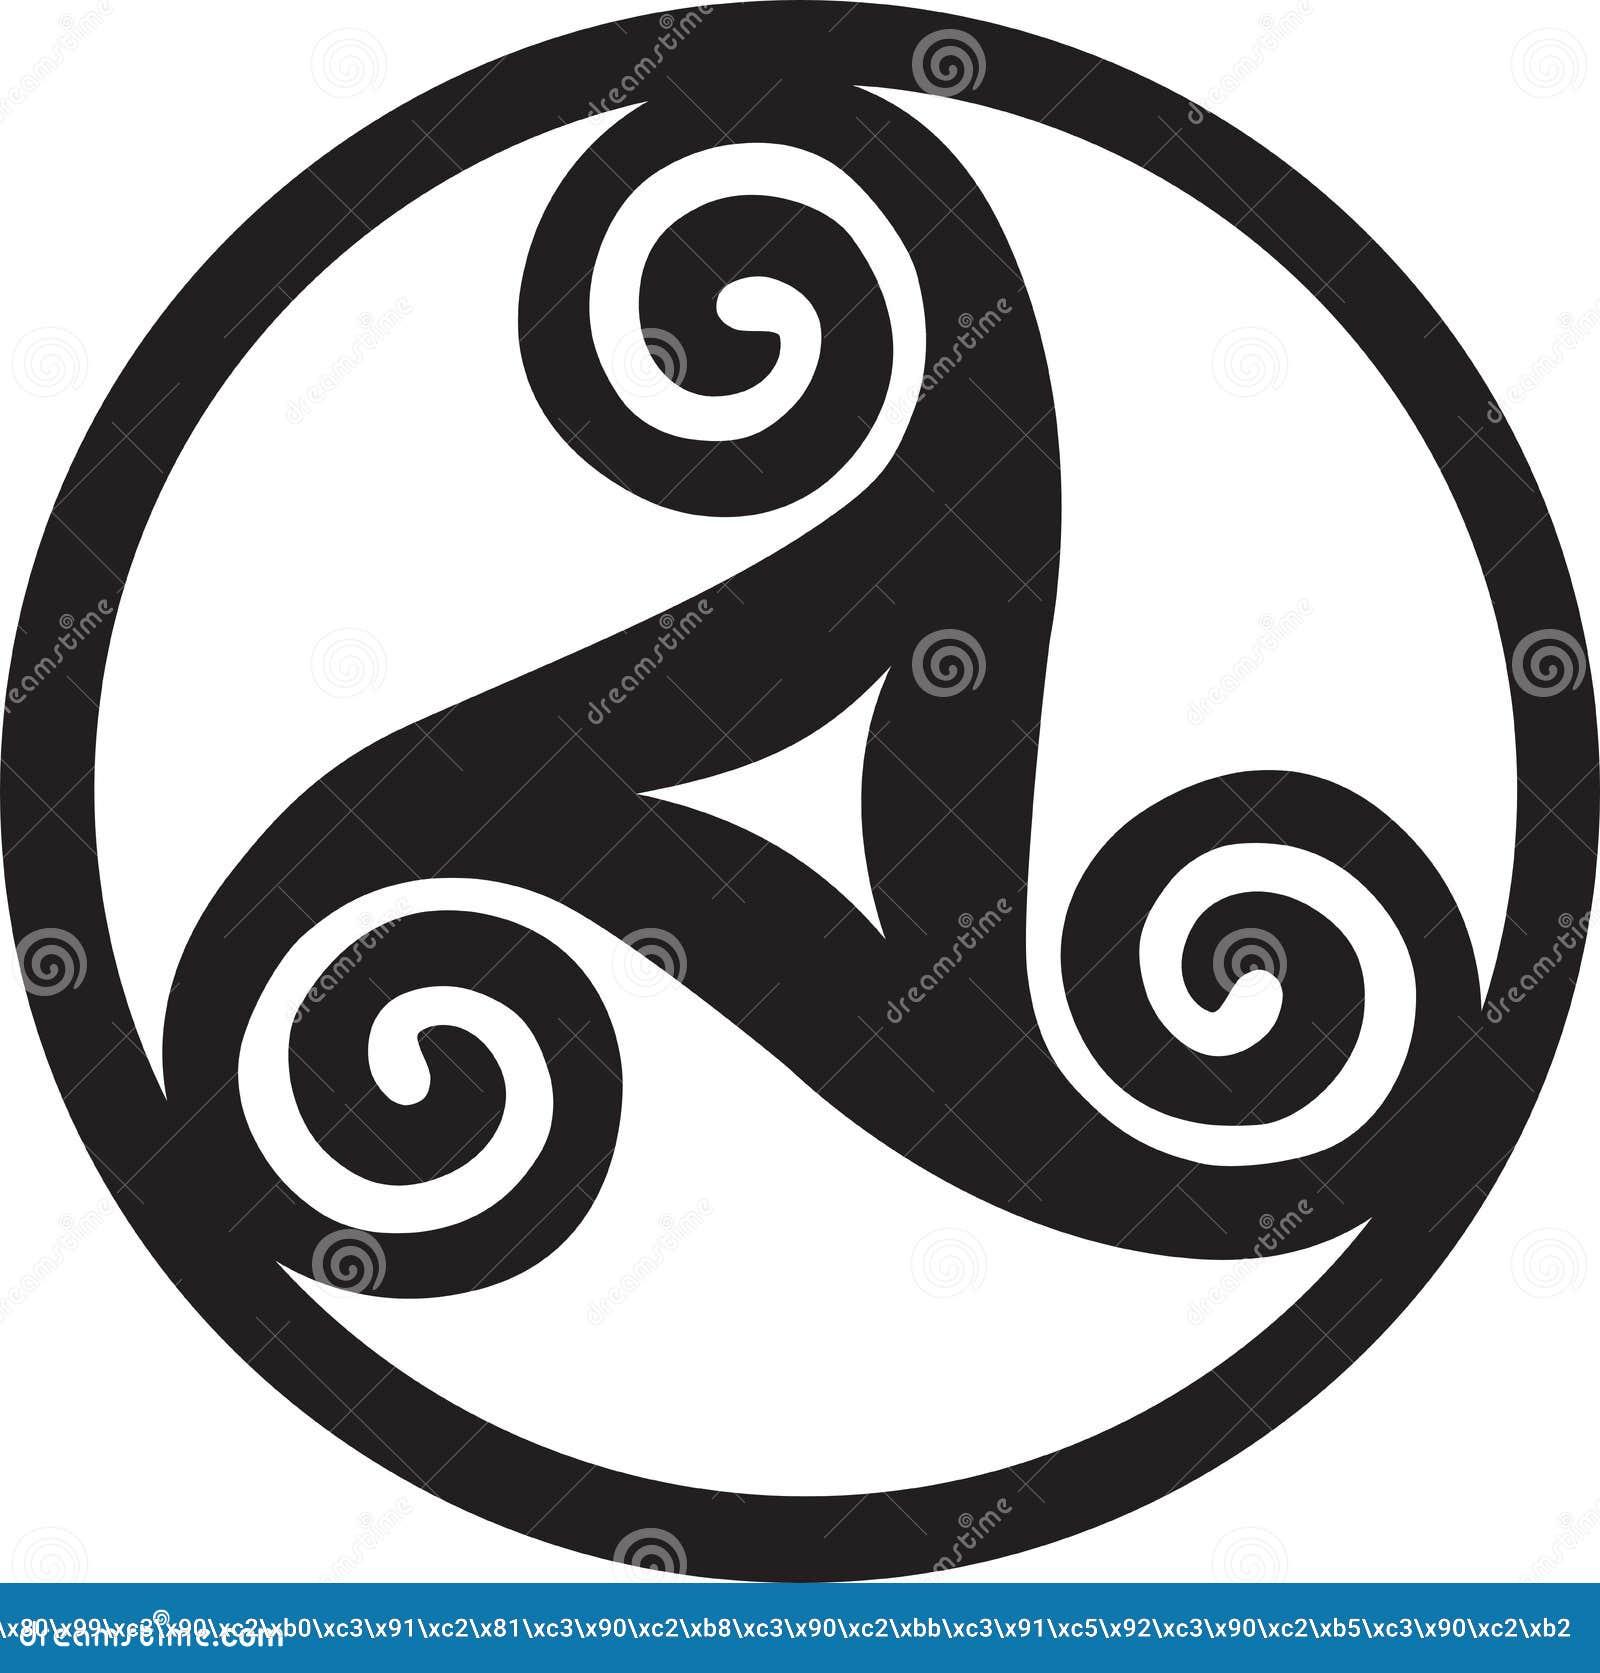 bdsm symbol ski